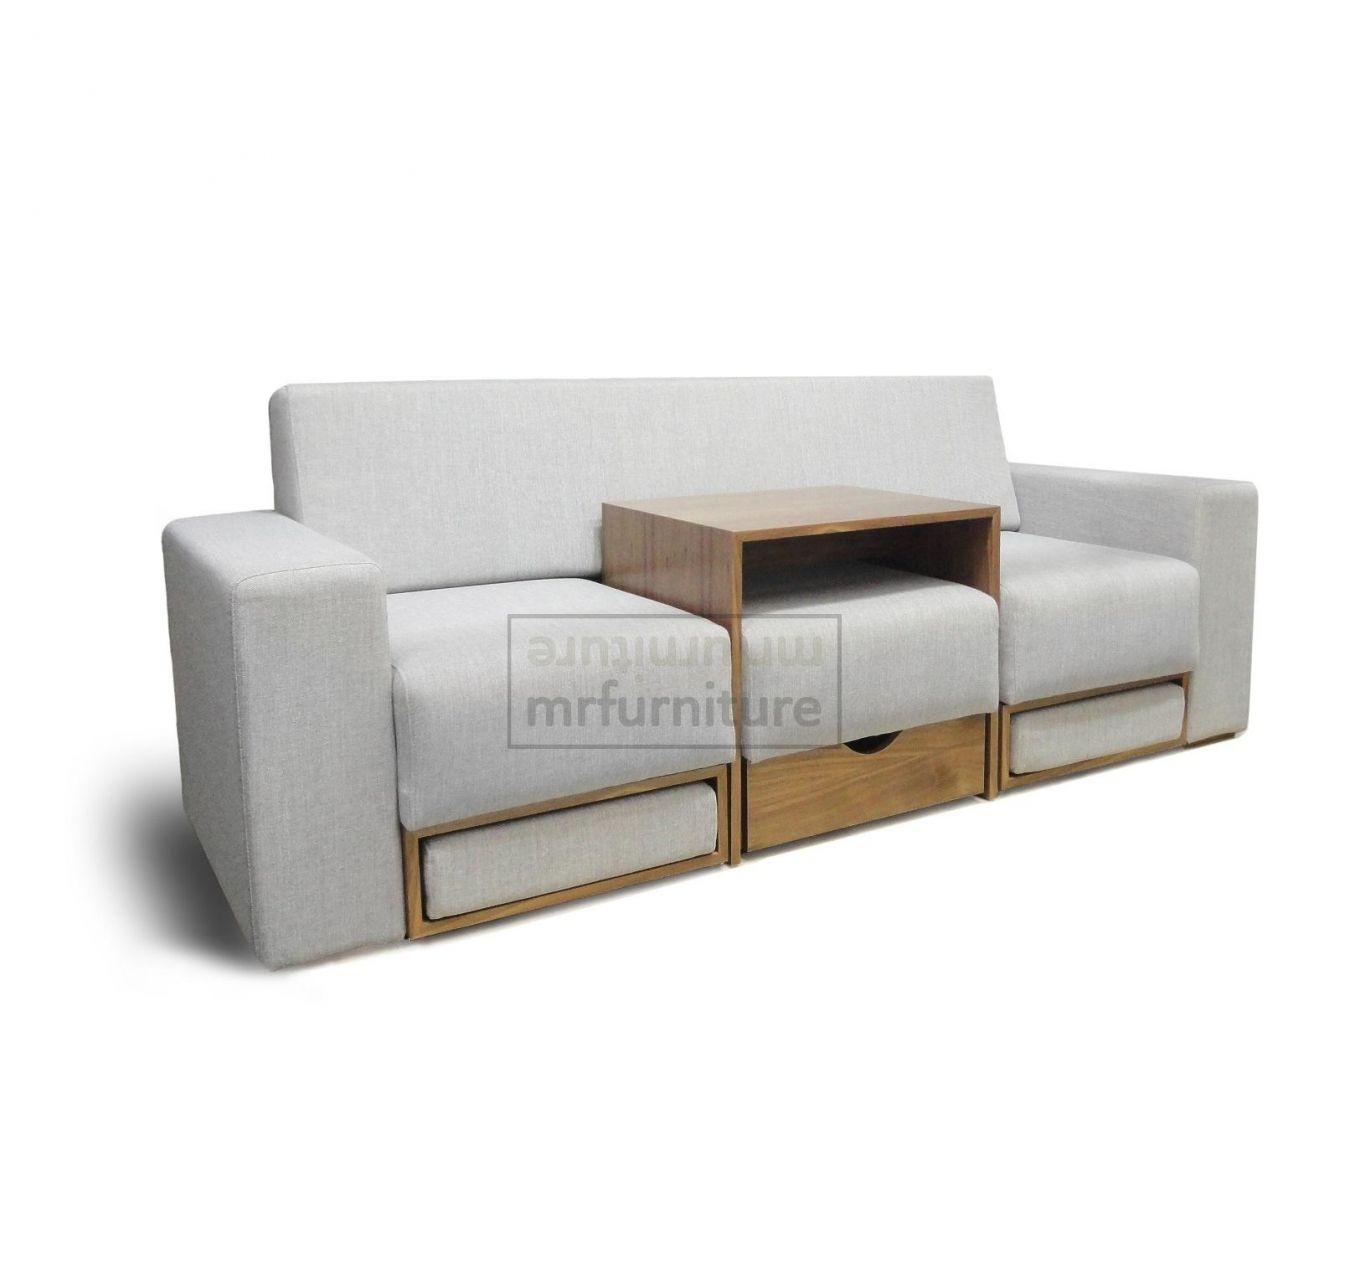 Soft_furniture_sofa Bed_transformer_www.mrfurniture.eu_light_grey